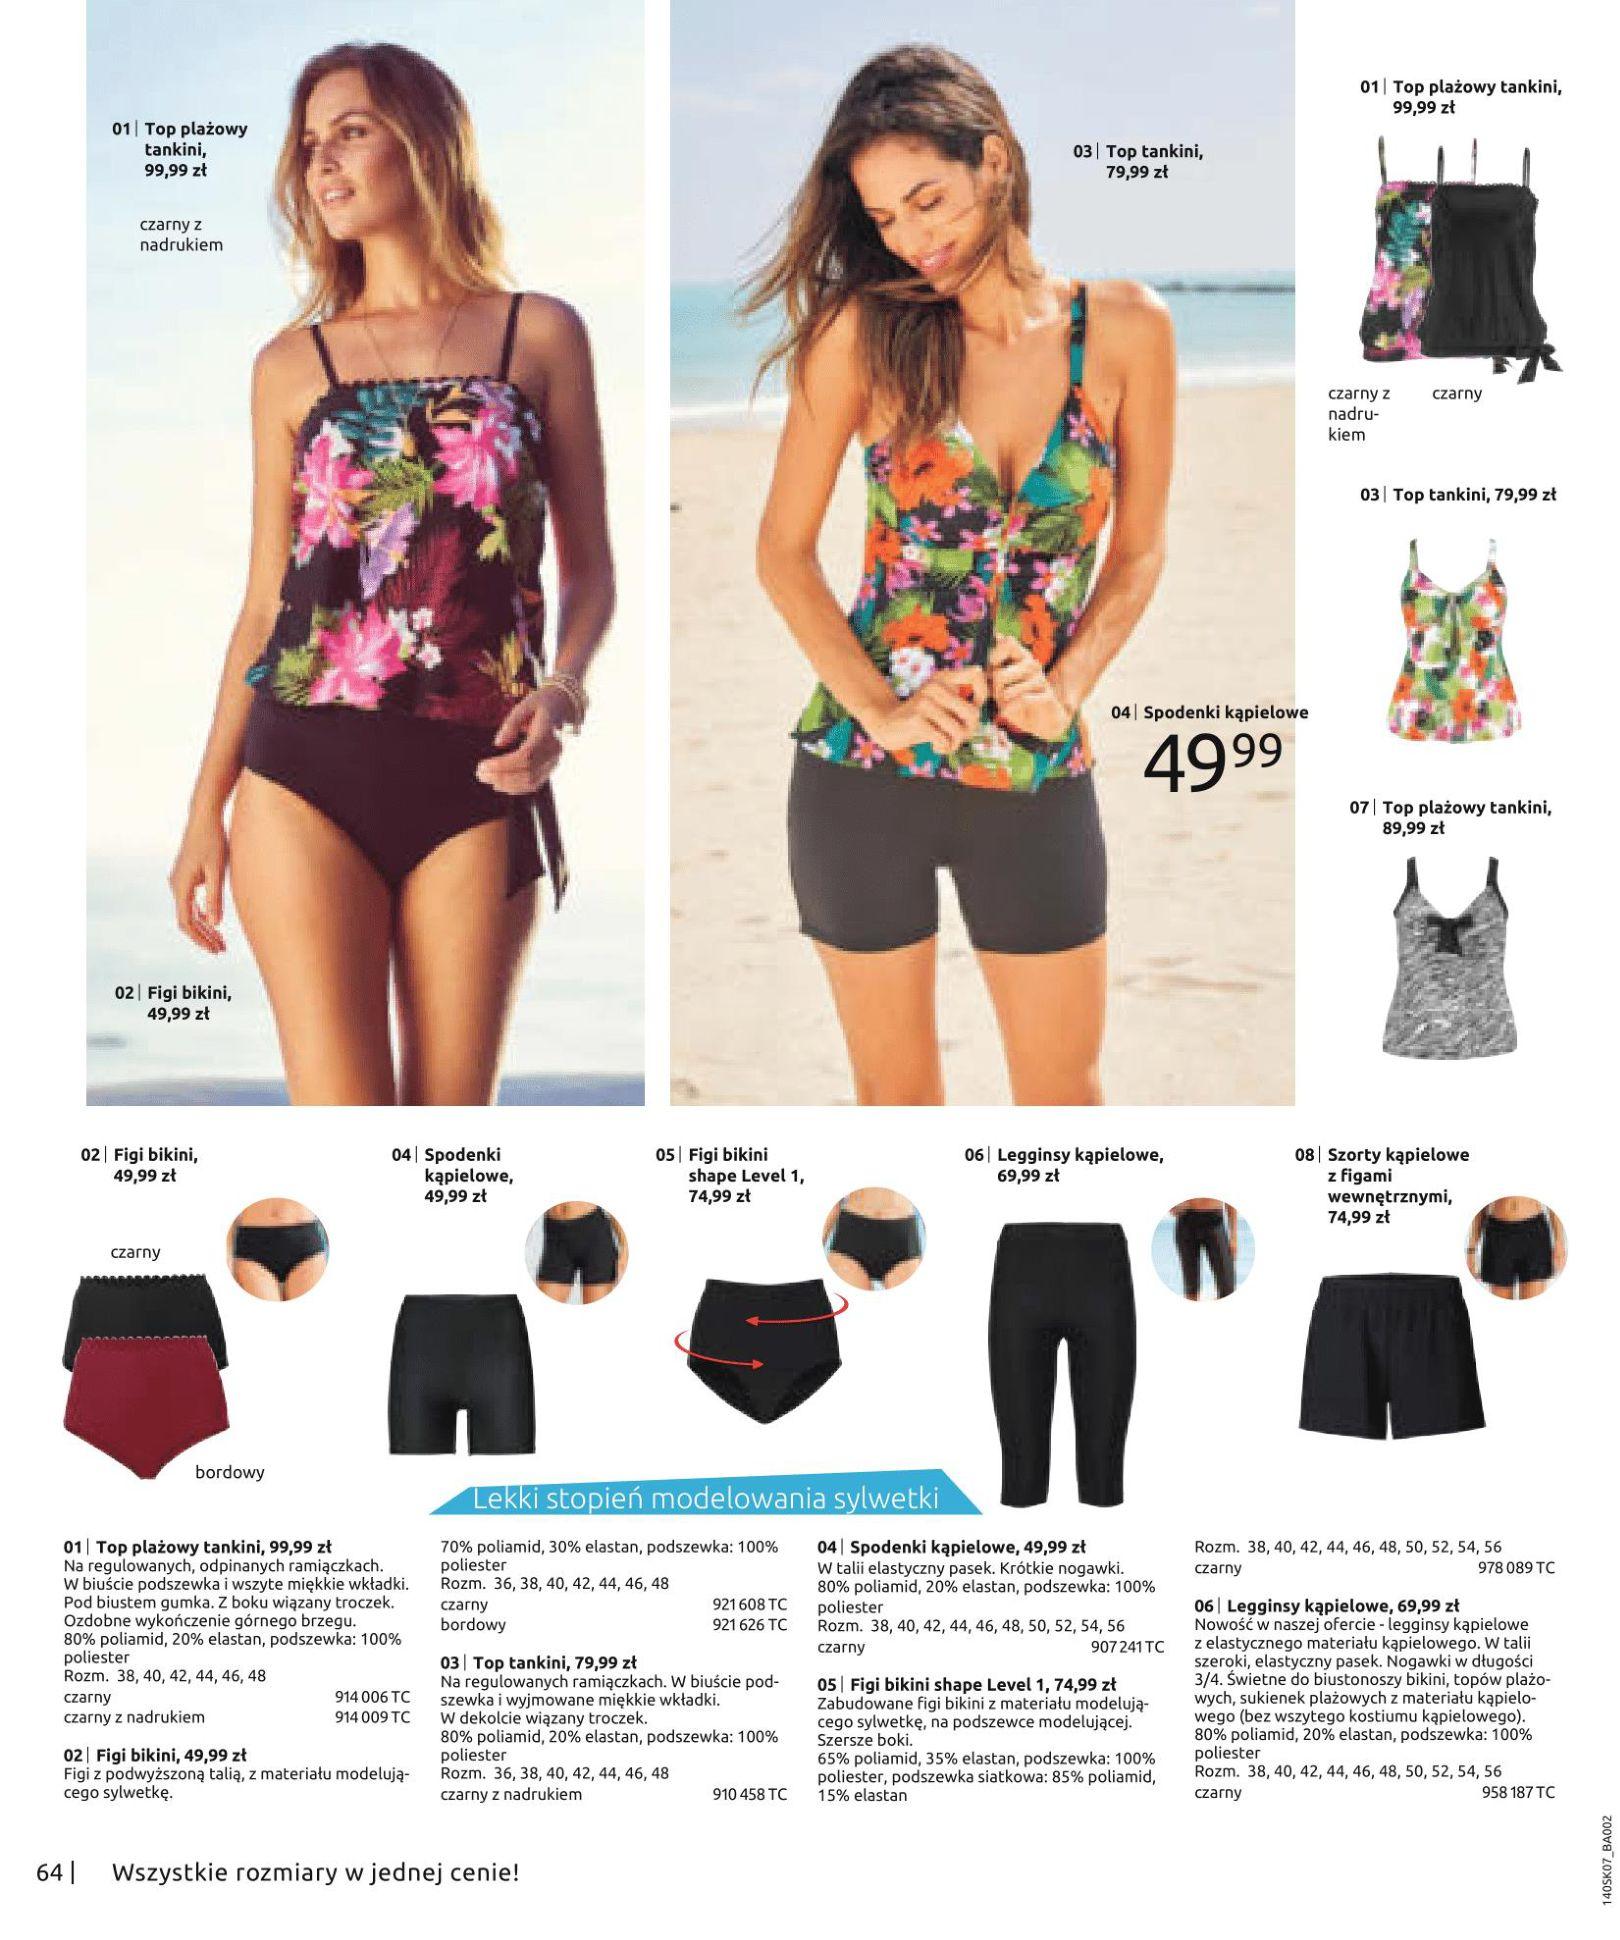 Gazetka Bonprix - Letnie trendy-02.07.2019-15.01.2020-page-66